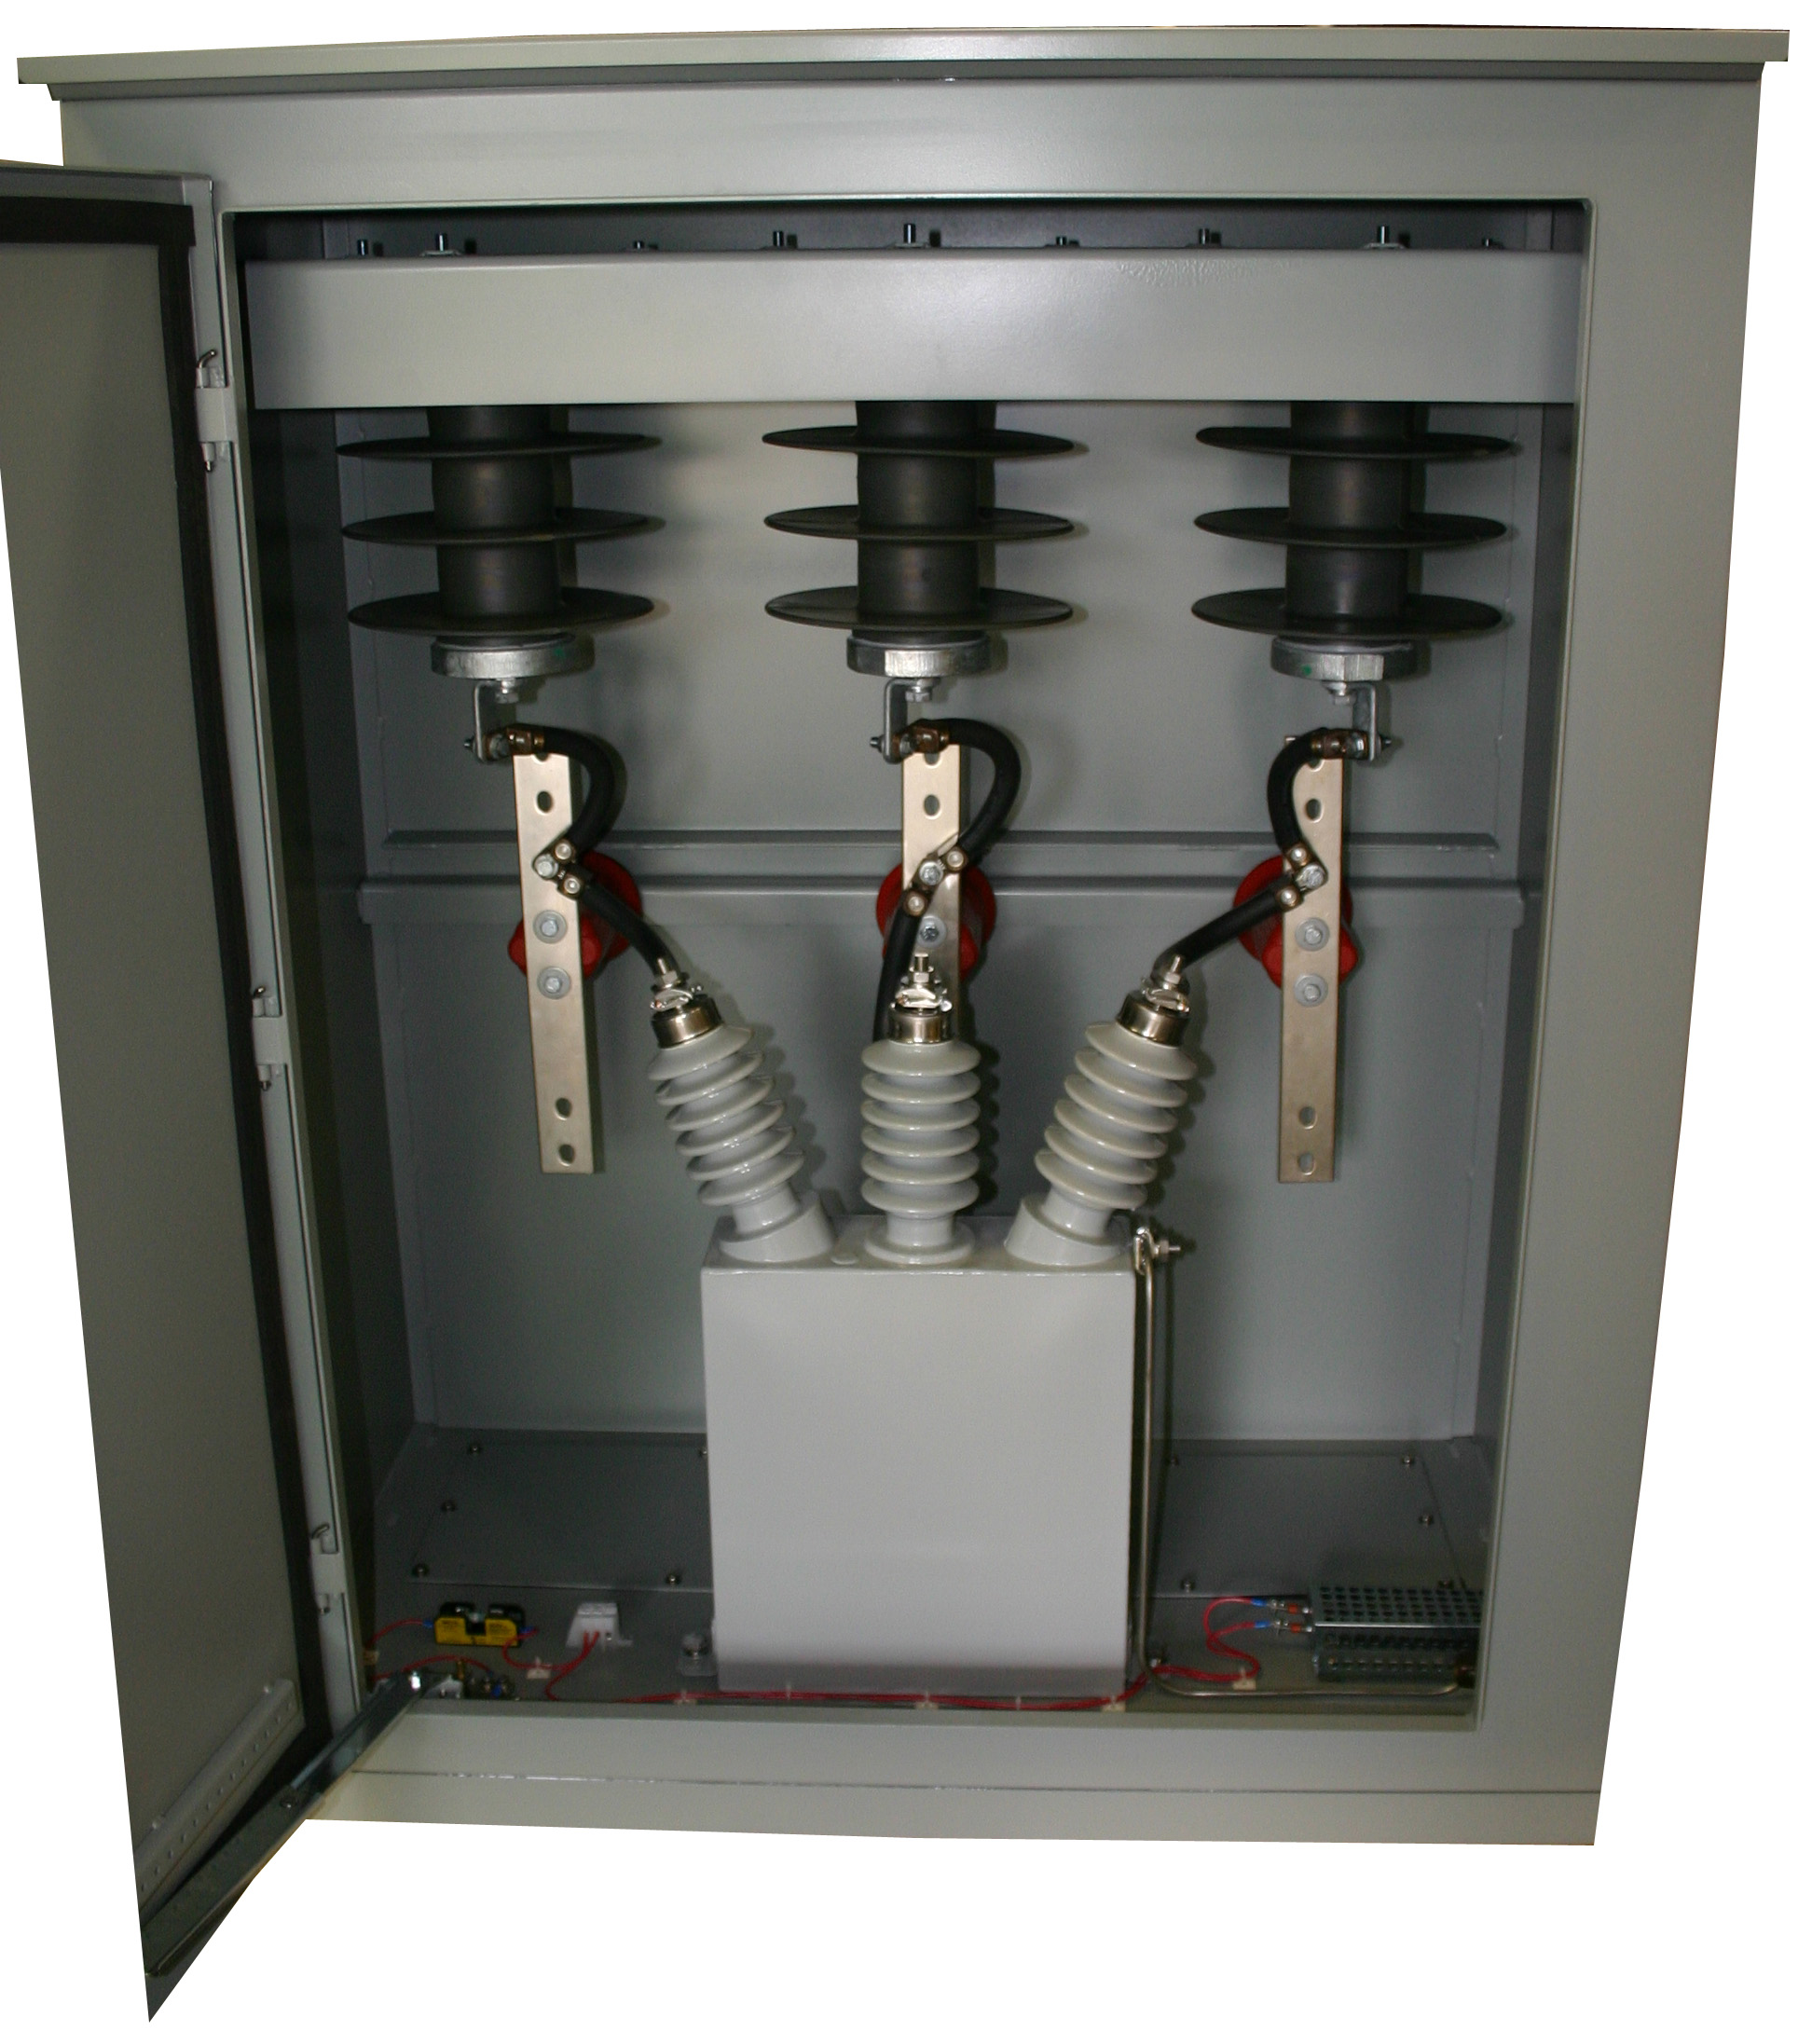 Generator Surge Protectors - Inside View